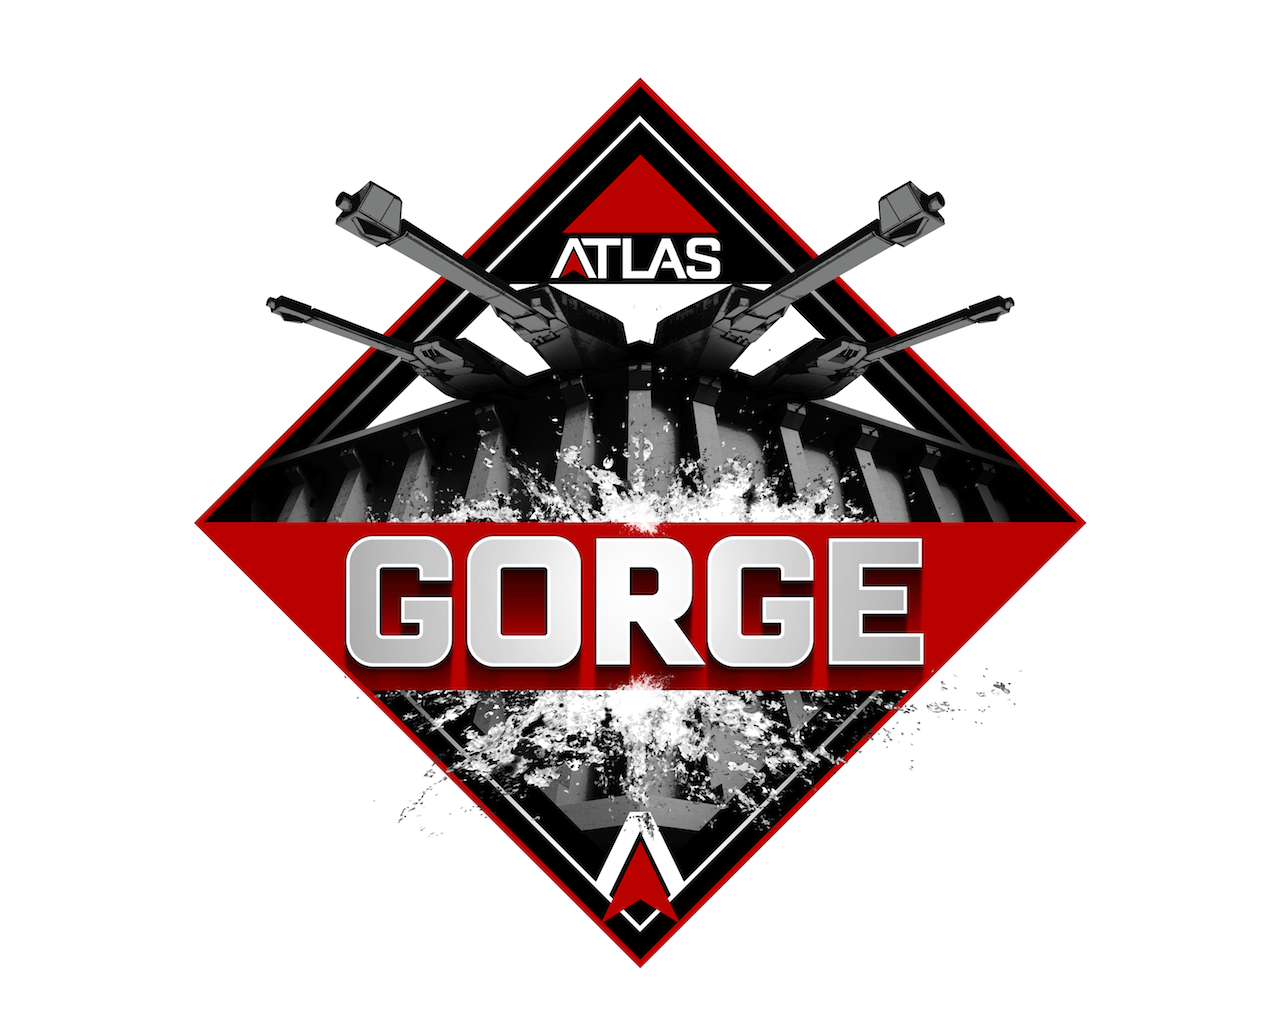 Atlas Corporation Wallpaper Additionally The Atlas Pro